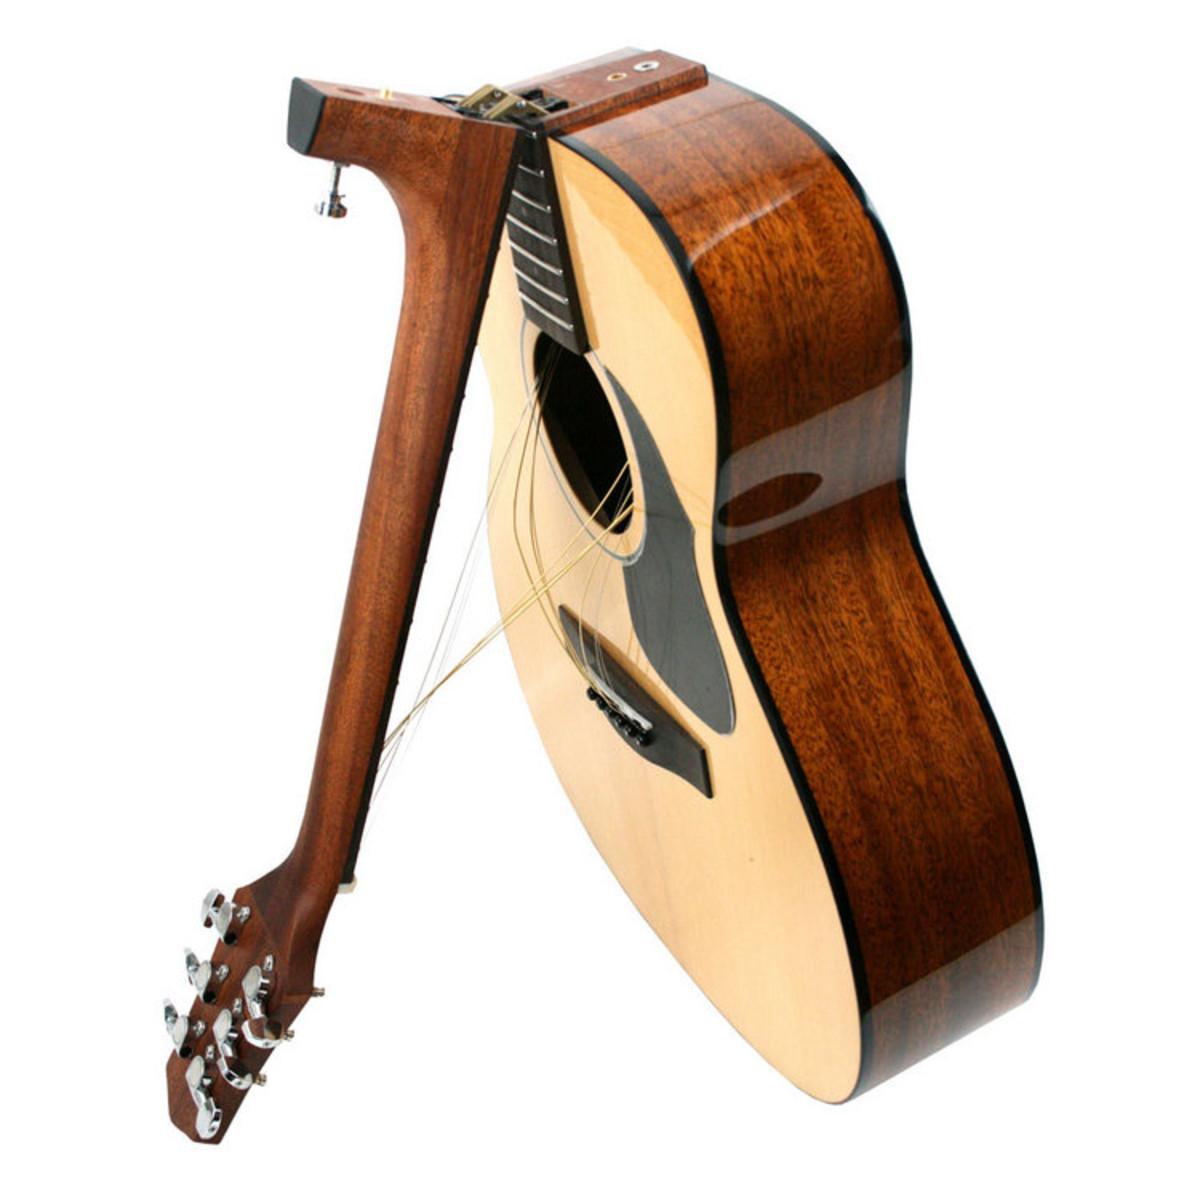 voyage air vaom 02 folding acoustic travel guitar at gear4music. Black Bedroom Furniture Sets. Home Design Ideas